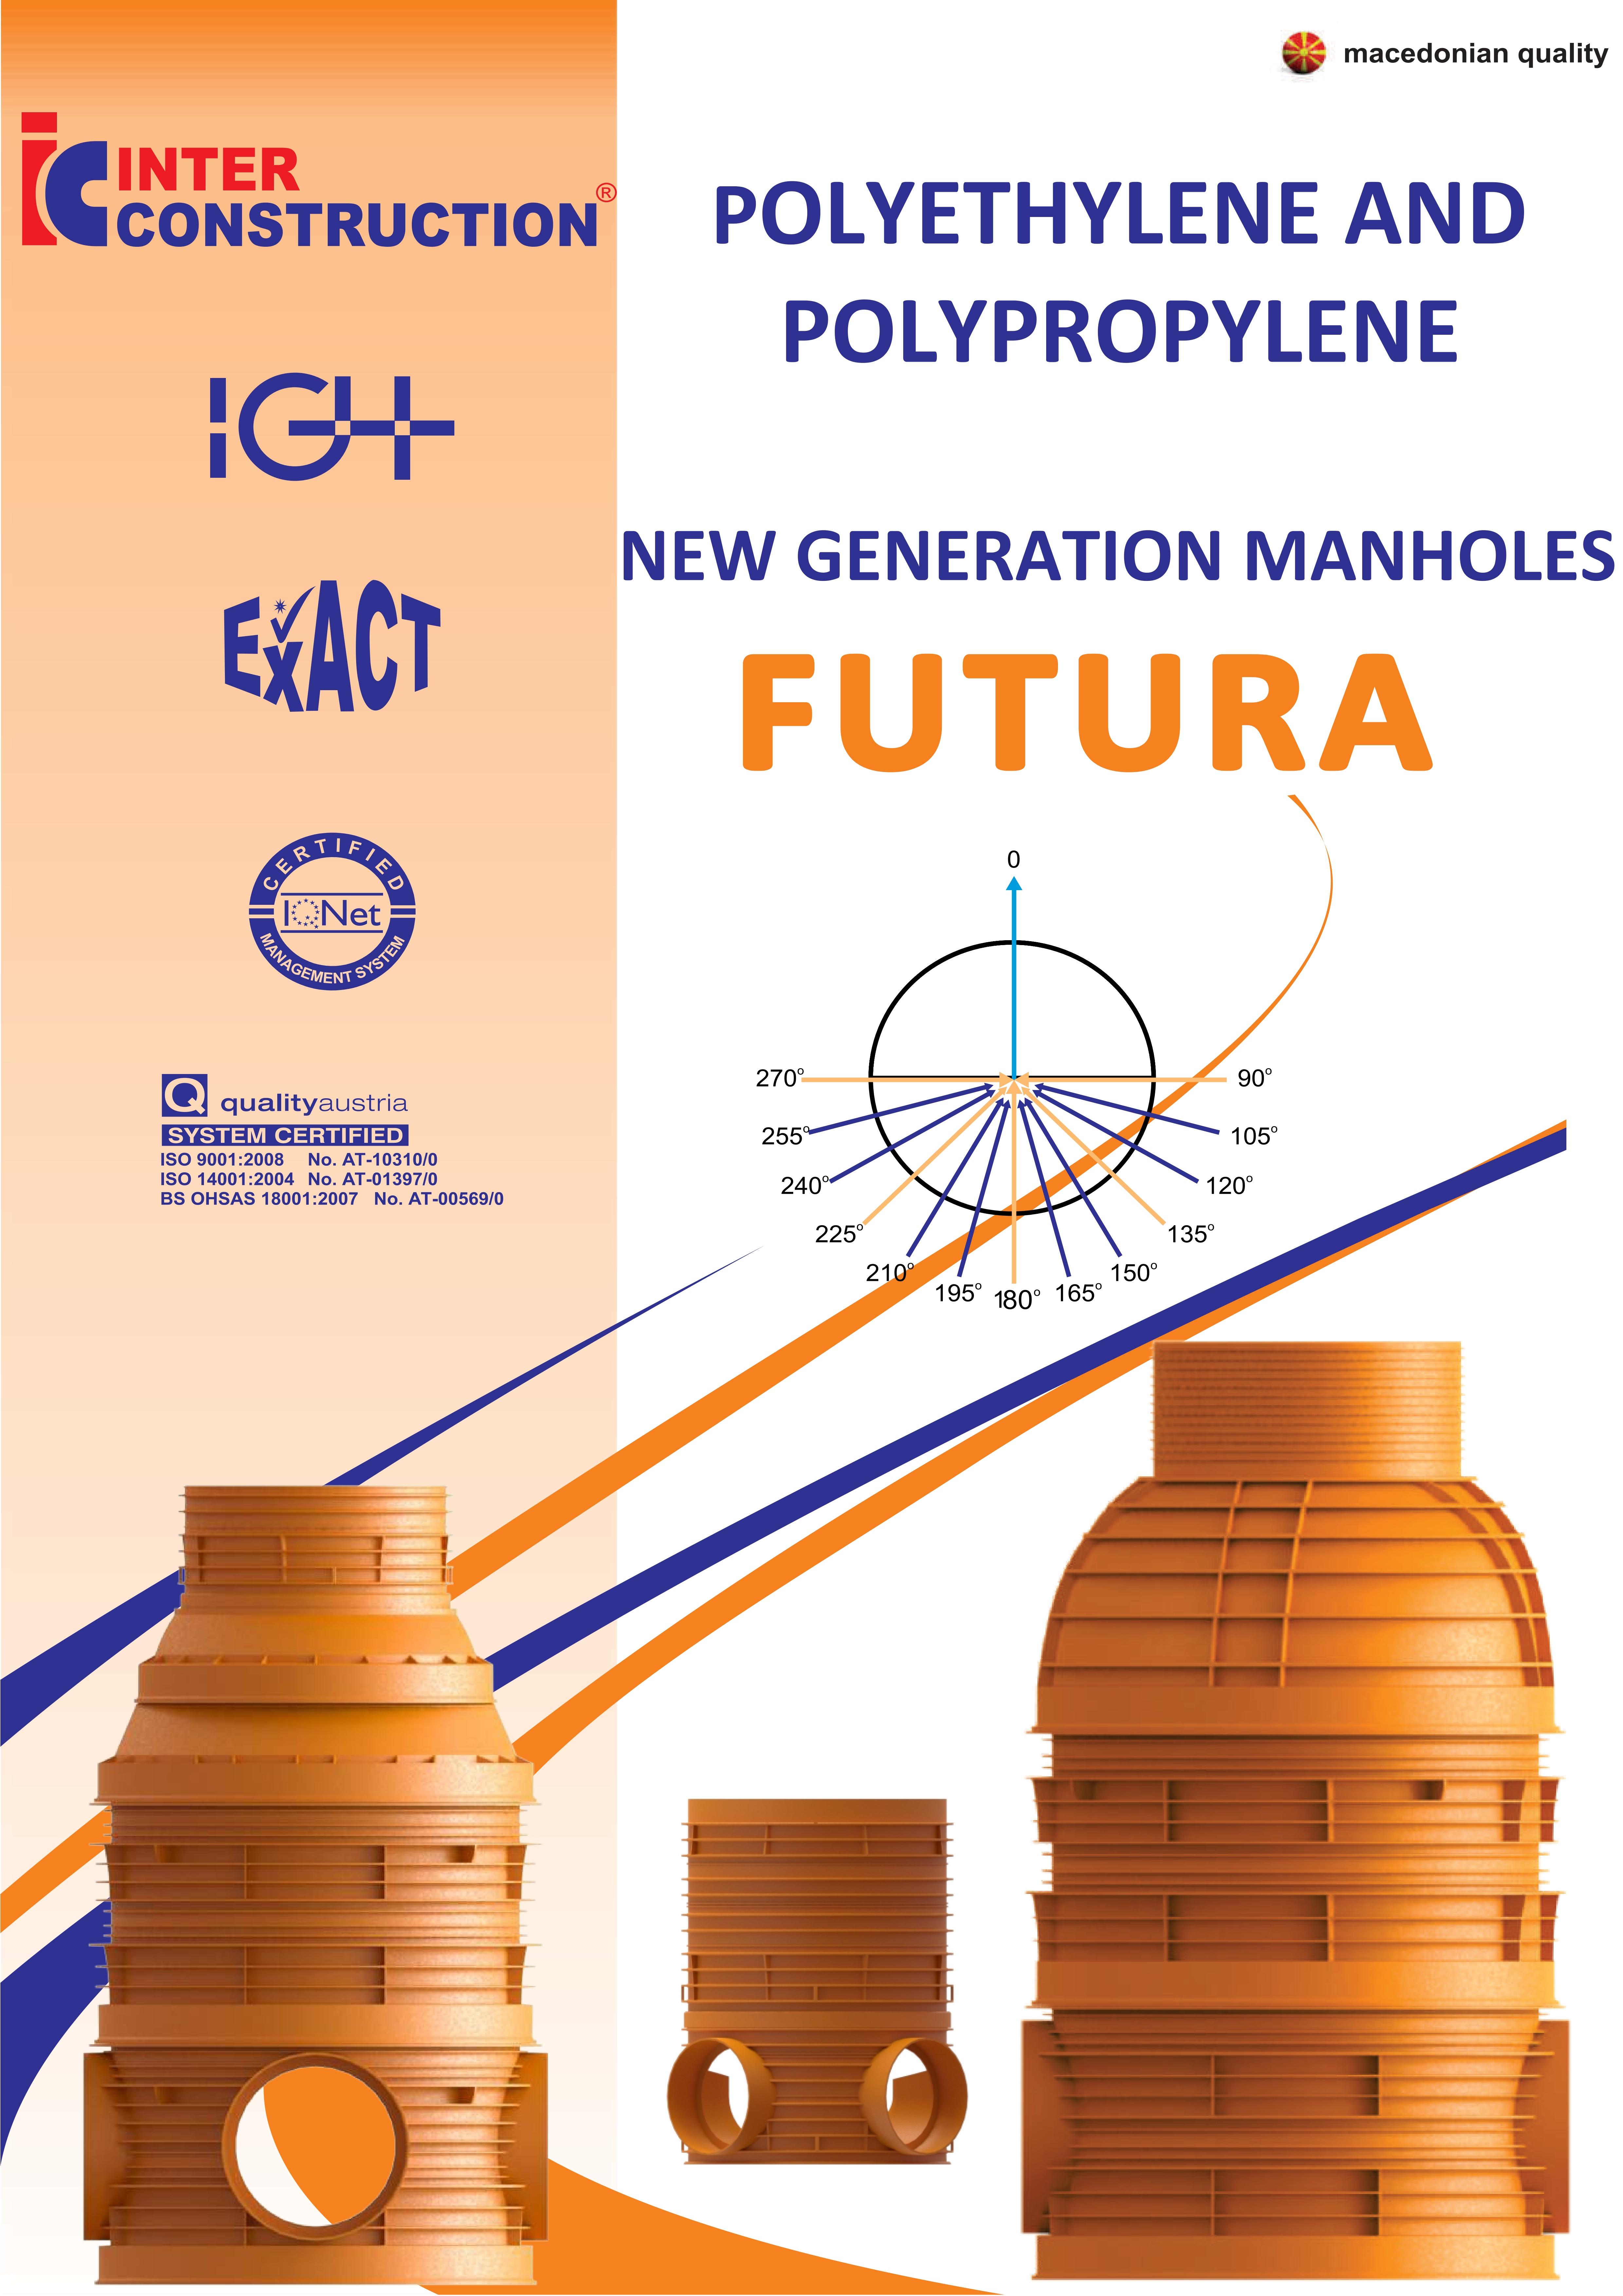 PP Futura manholes brochure